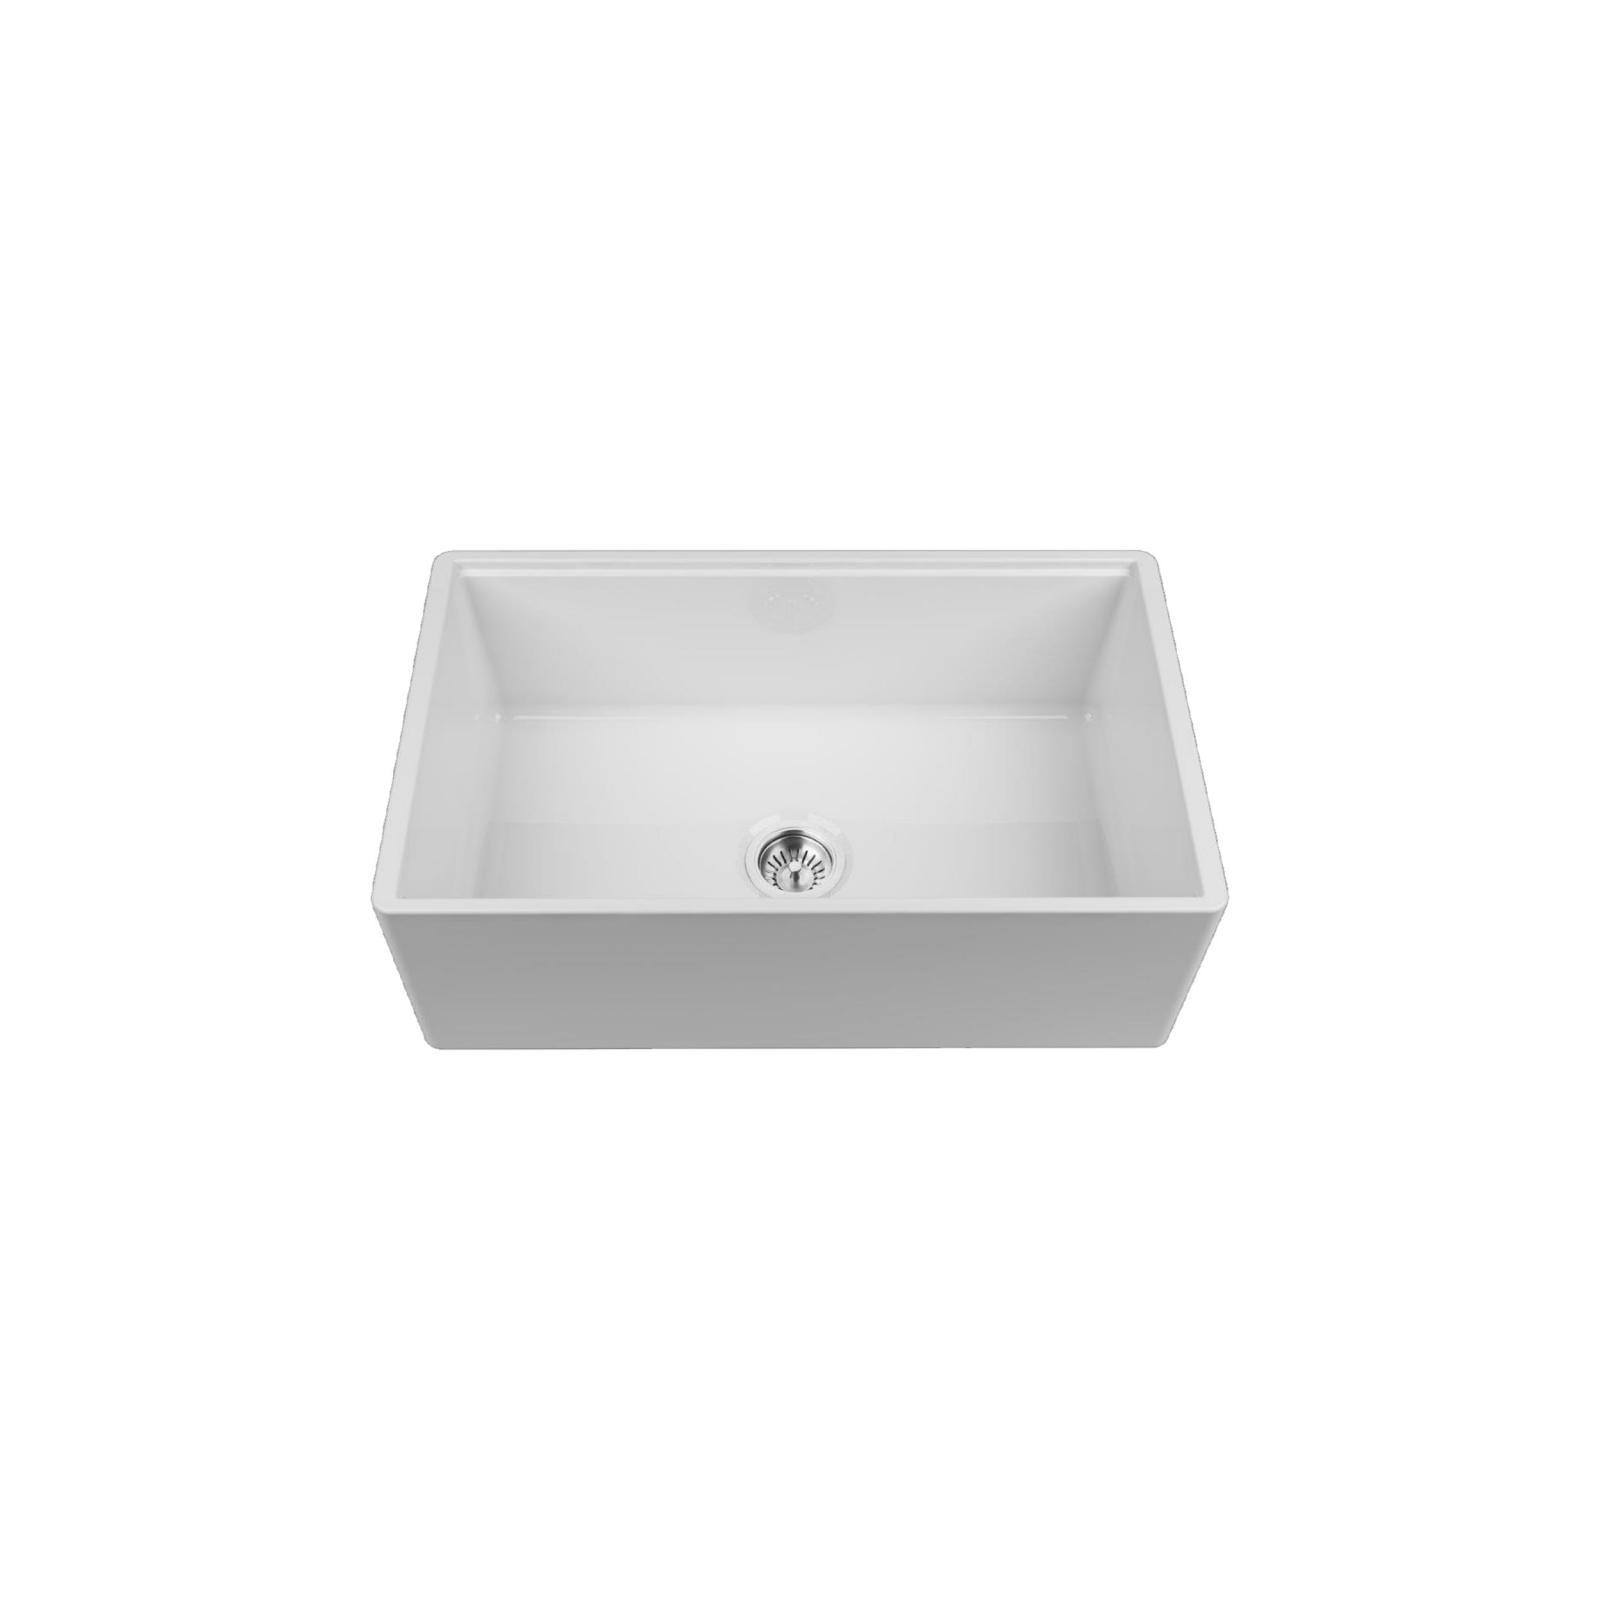 High-quality sink Louis Le Grand I - single bowl, ceramic - 2